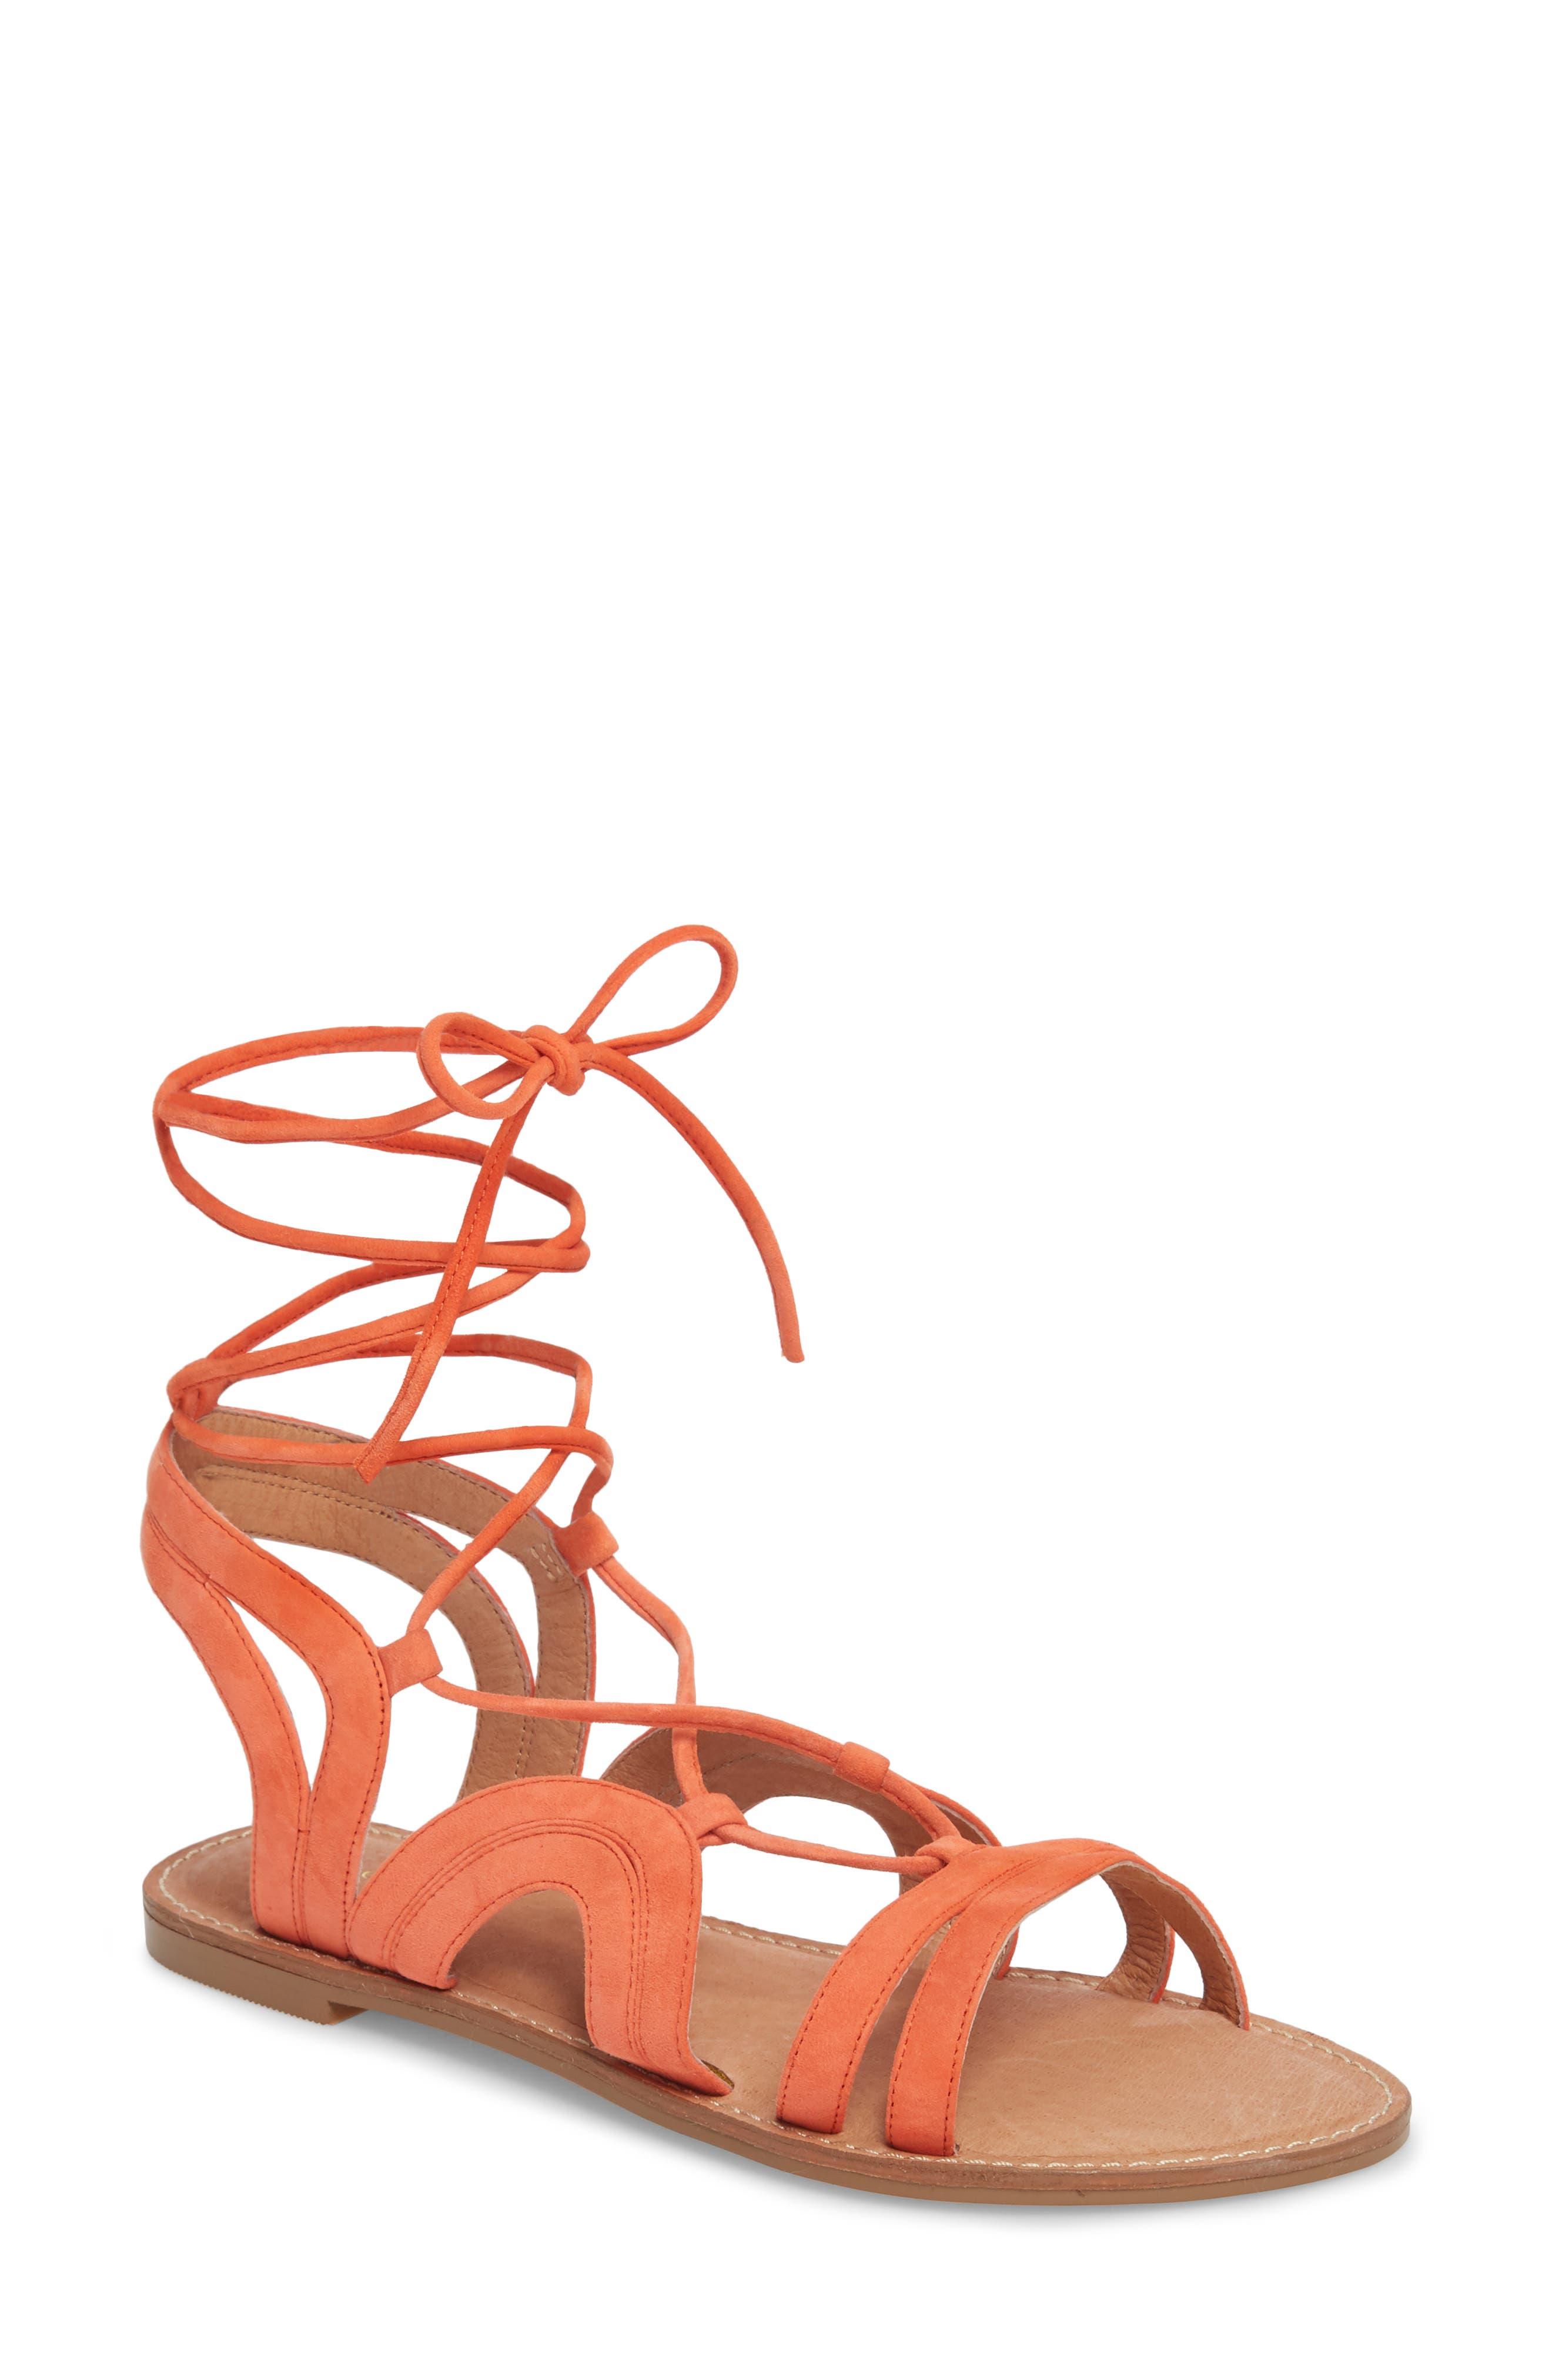 Lilian Gladiator Sandal,                             Main thumbnail 3, color,